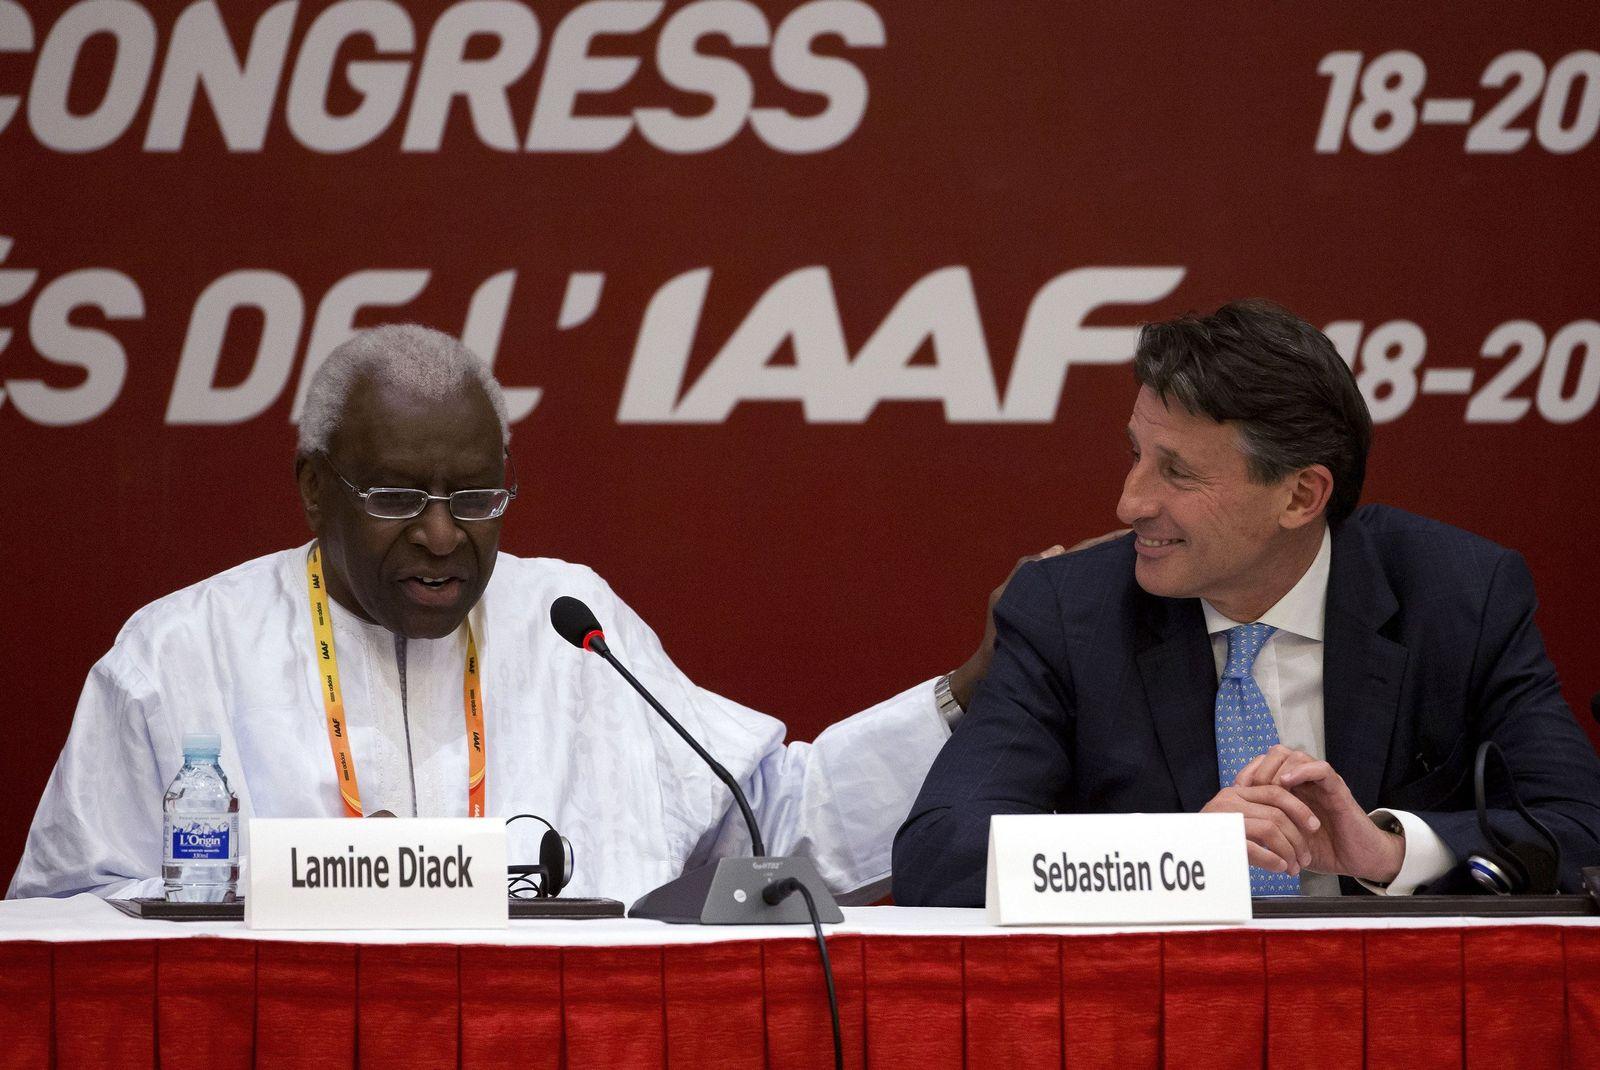 China Russia Doping Diack Investigated